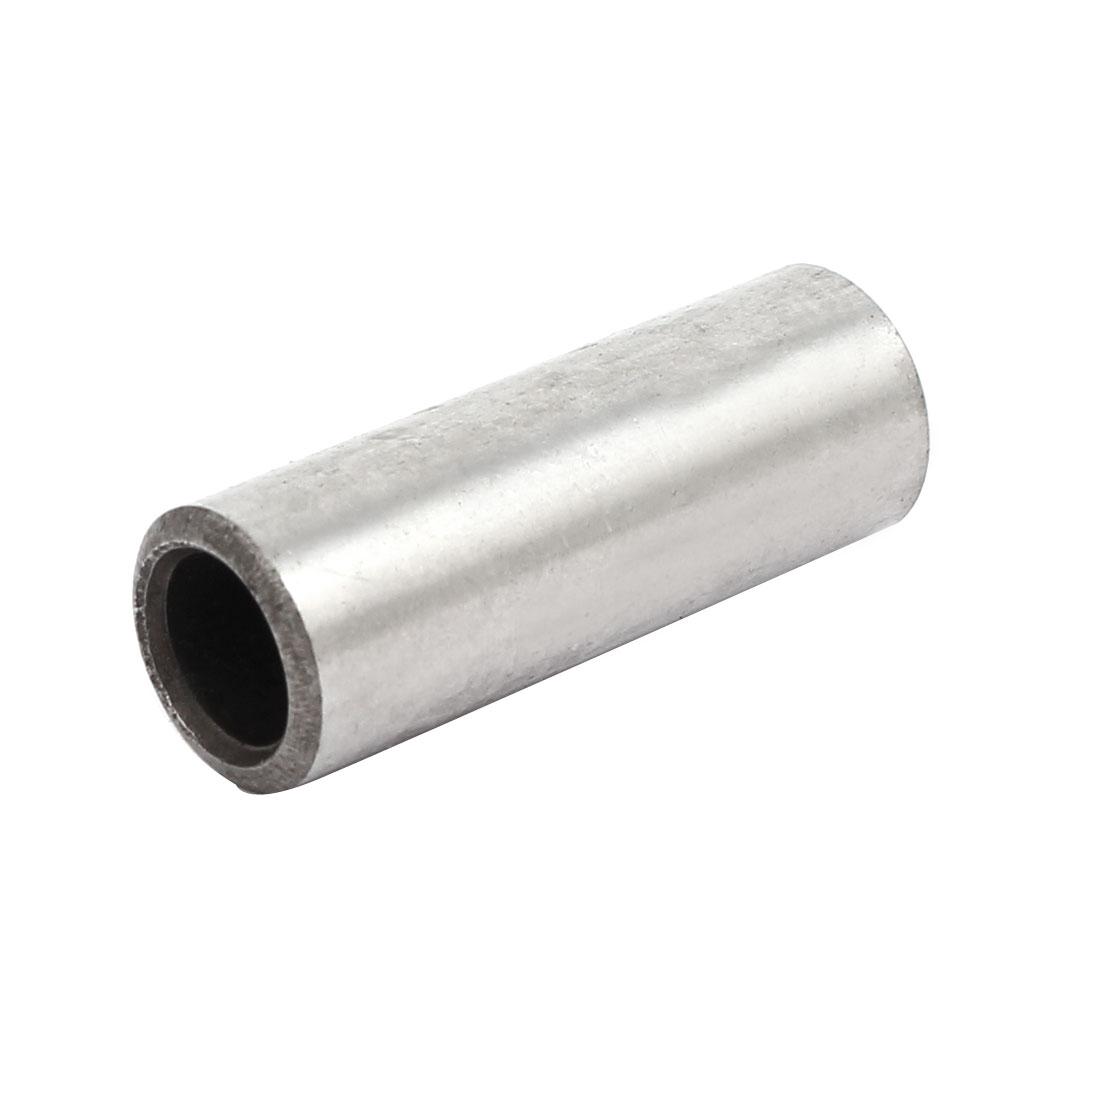 12mm OD 34mm Height Iron Piston Gudgeon Pin Air Compressor Accessory